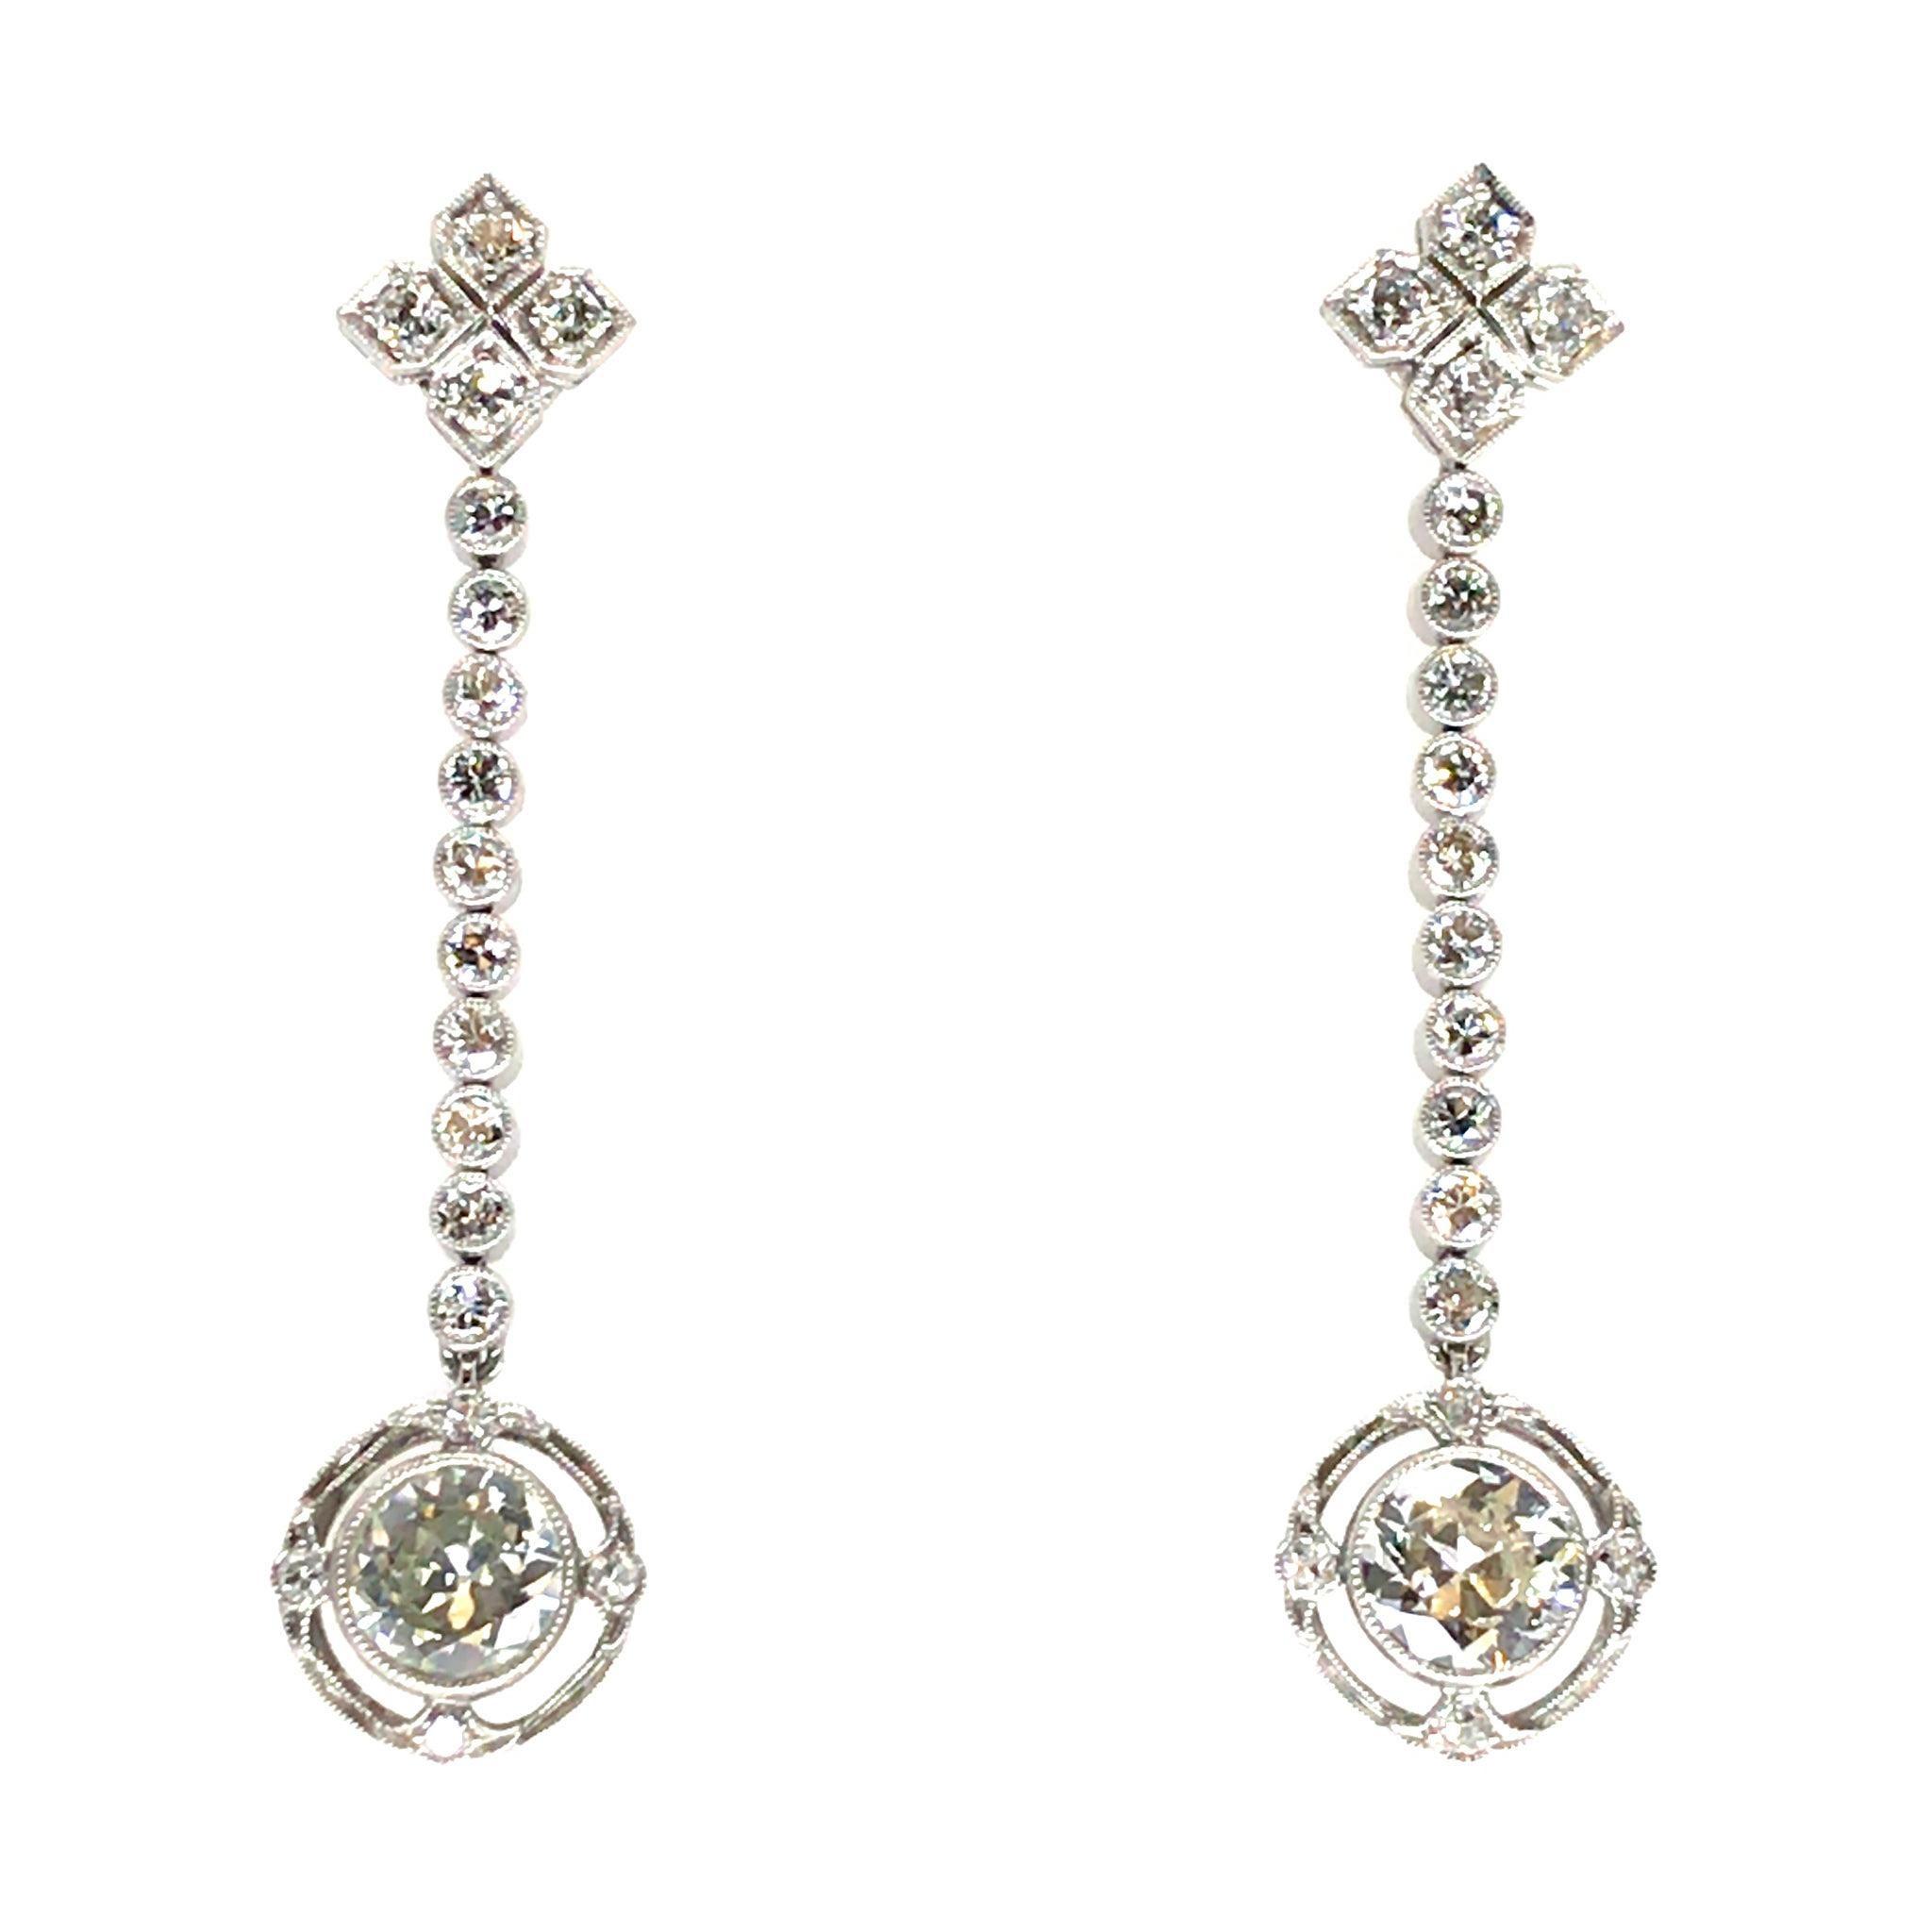 Platinum Art Deco Drop Diamond Earrings